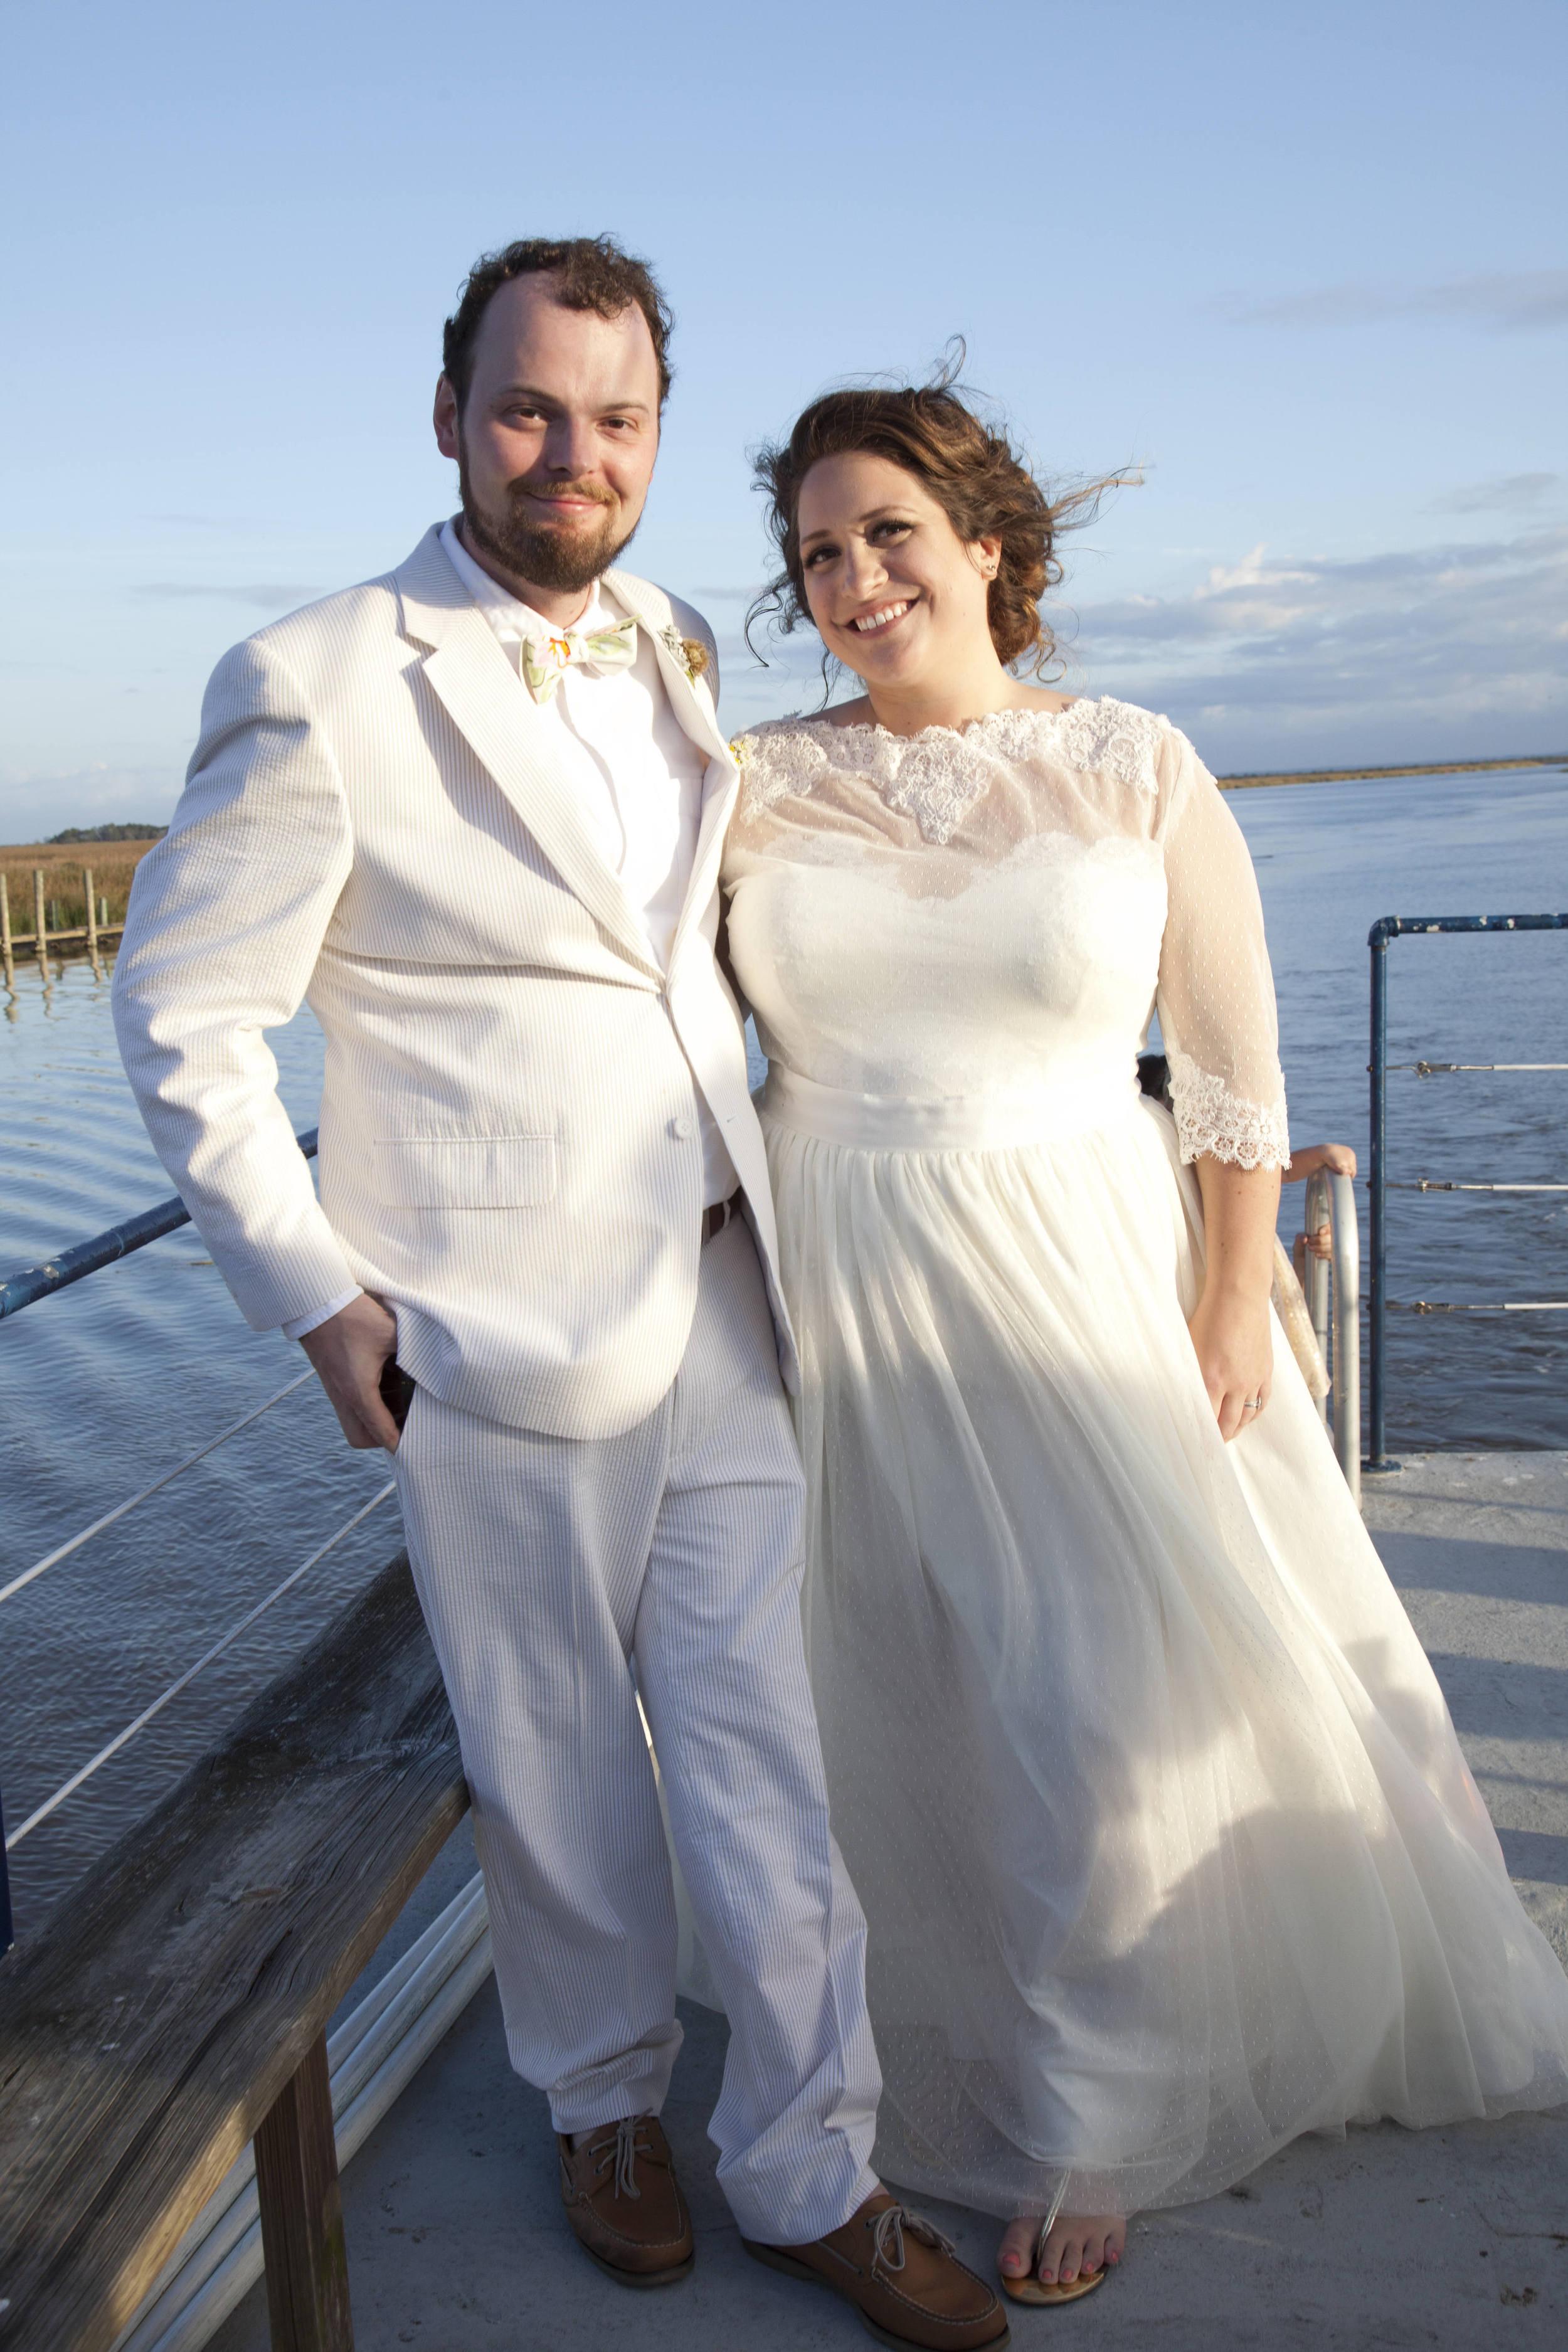 Caroline-Kilgore-photography-ivory-and-beau-bridal-boutique-savannah-wedding-dresses-savannah-bridal-boutique-savannah-wedding-gowns-custom-wedding-dress-vintage-wedding-dress-swiss-dot-wedding-dress-shrimp-boat-wedding-8.JPG